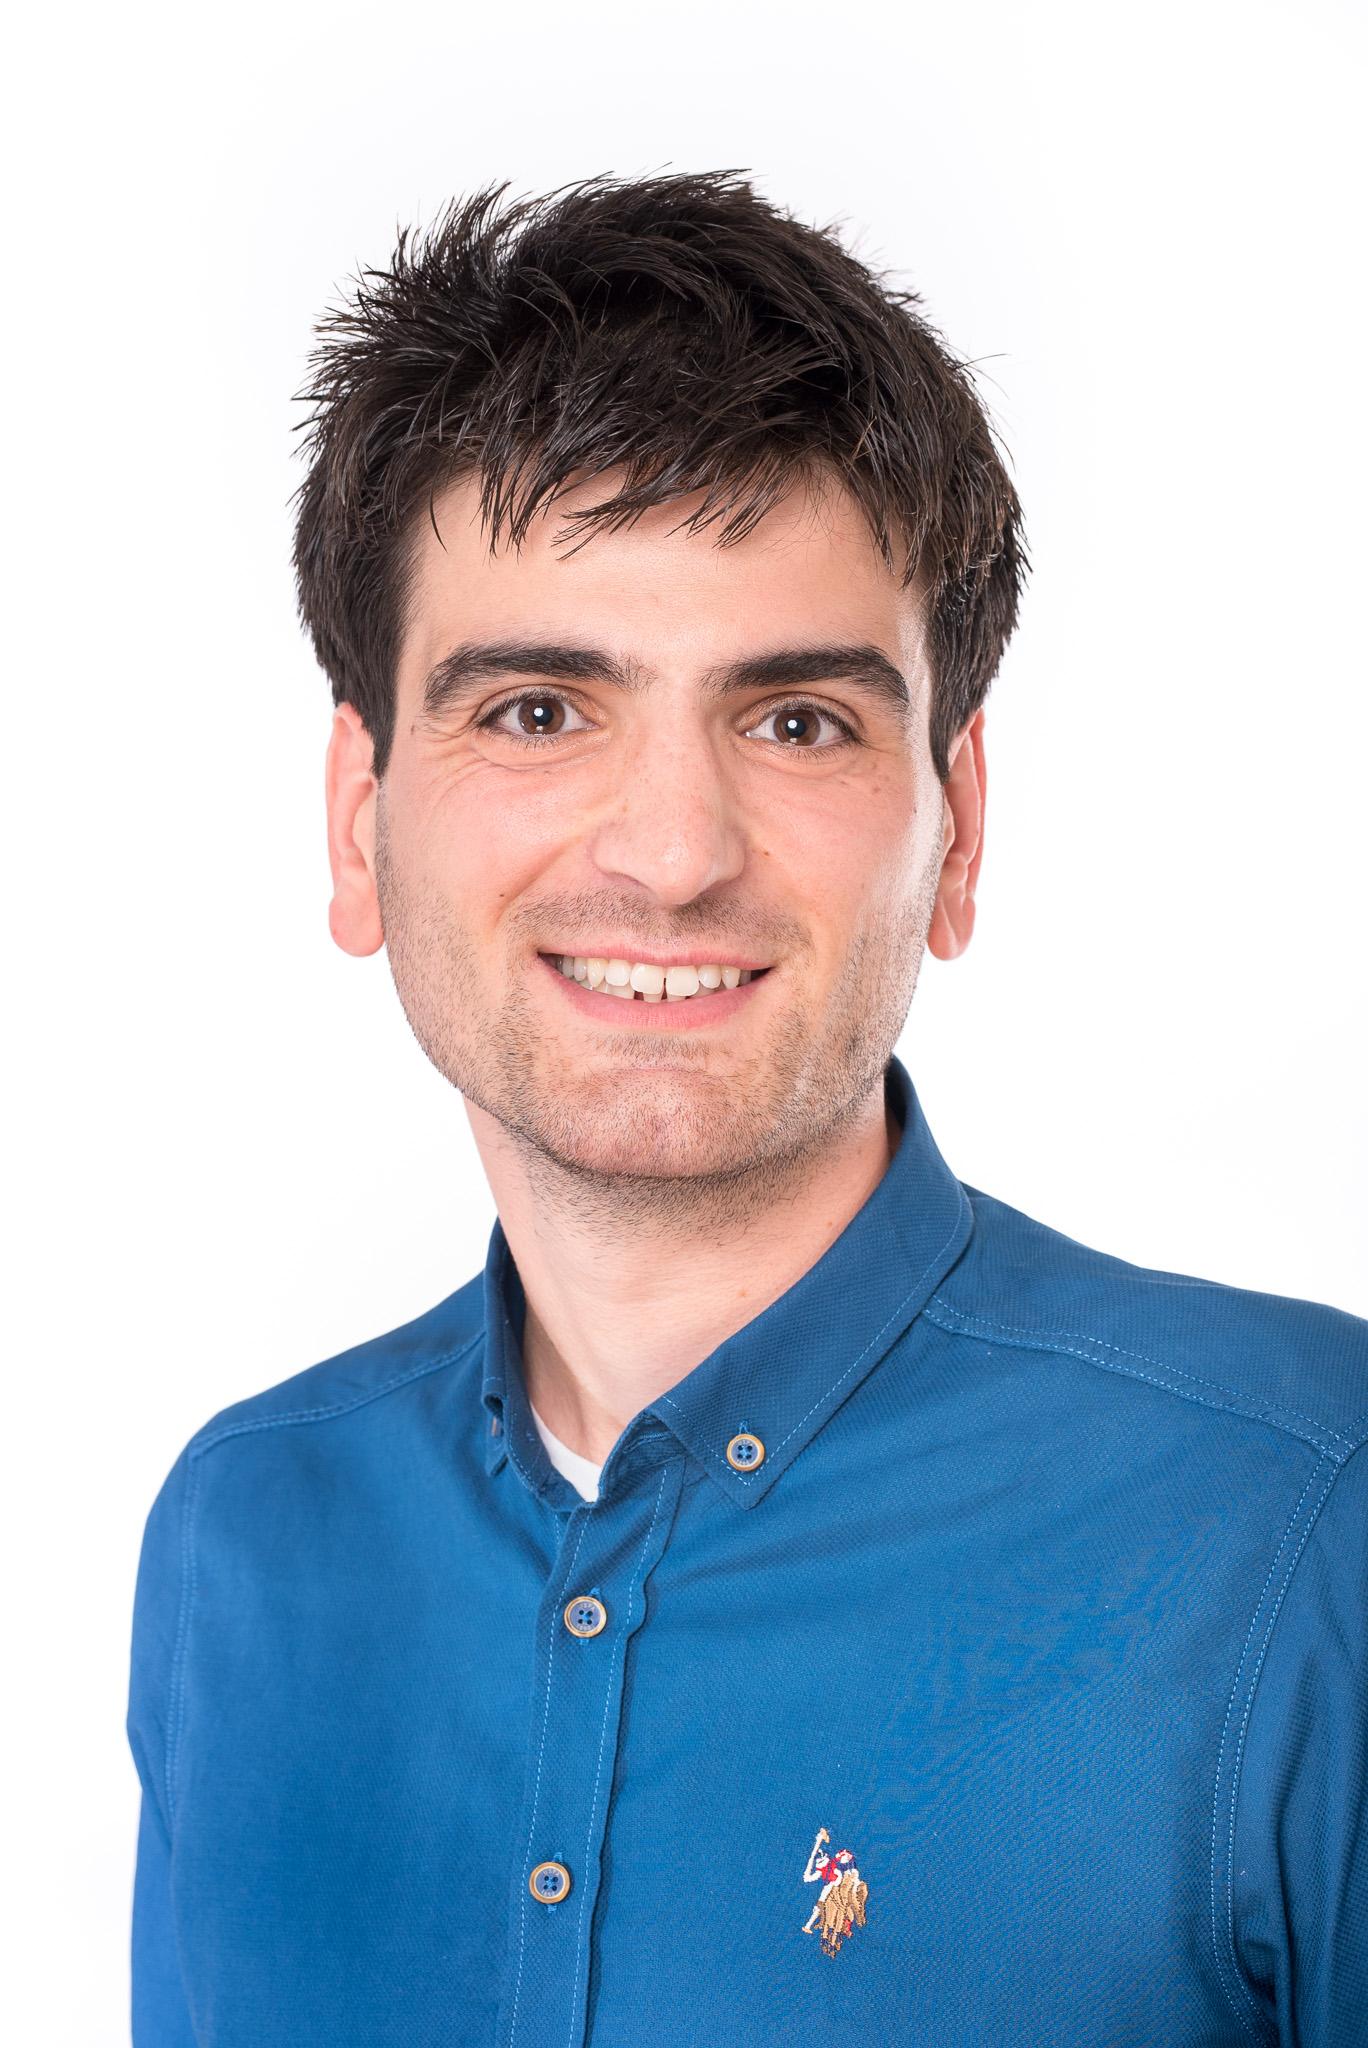 Portretfoto van medewerker Ugur Golbasi